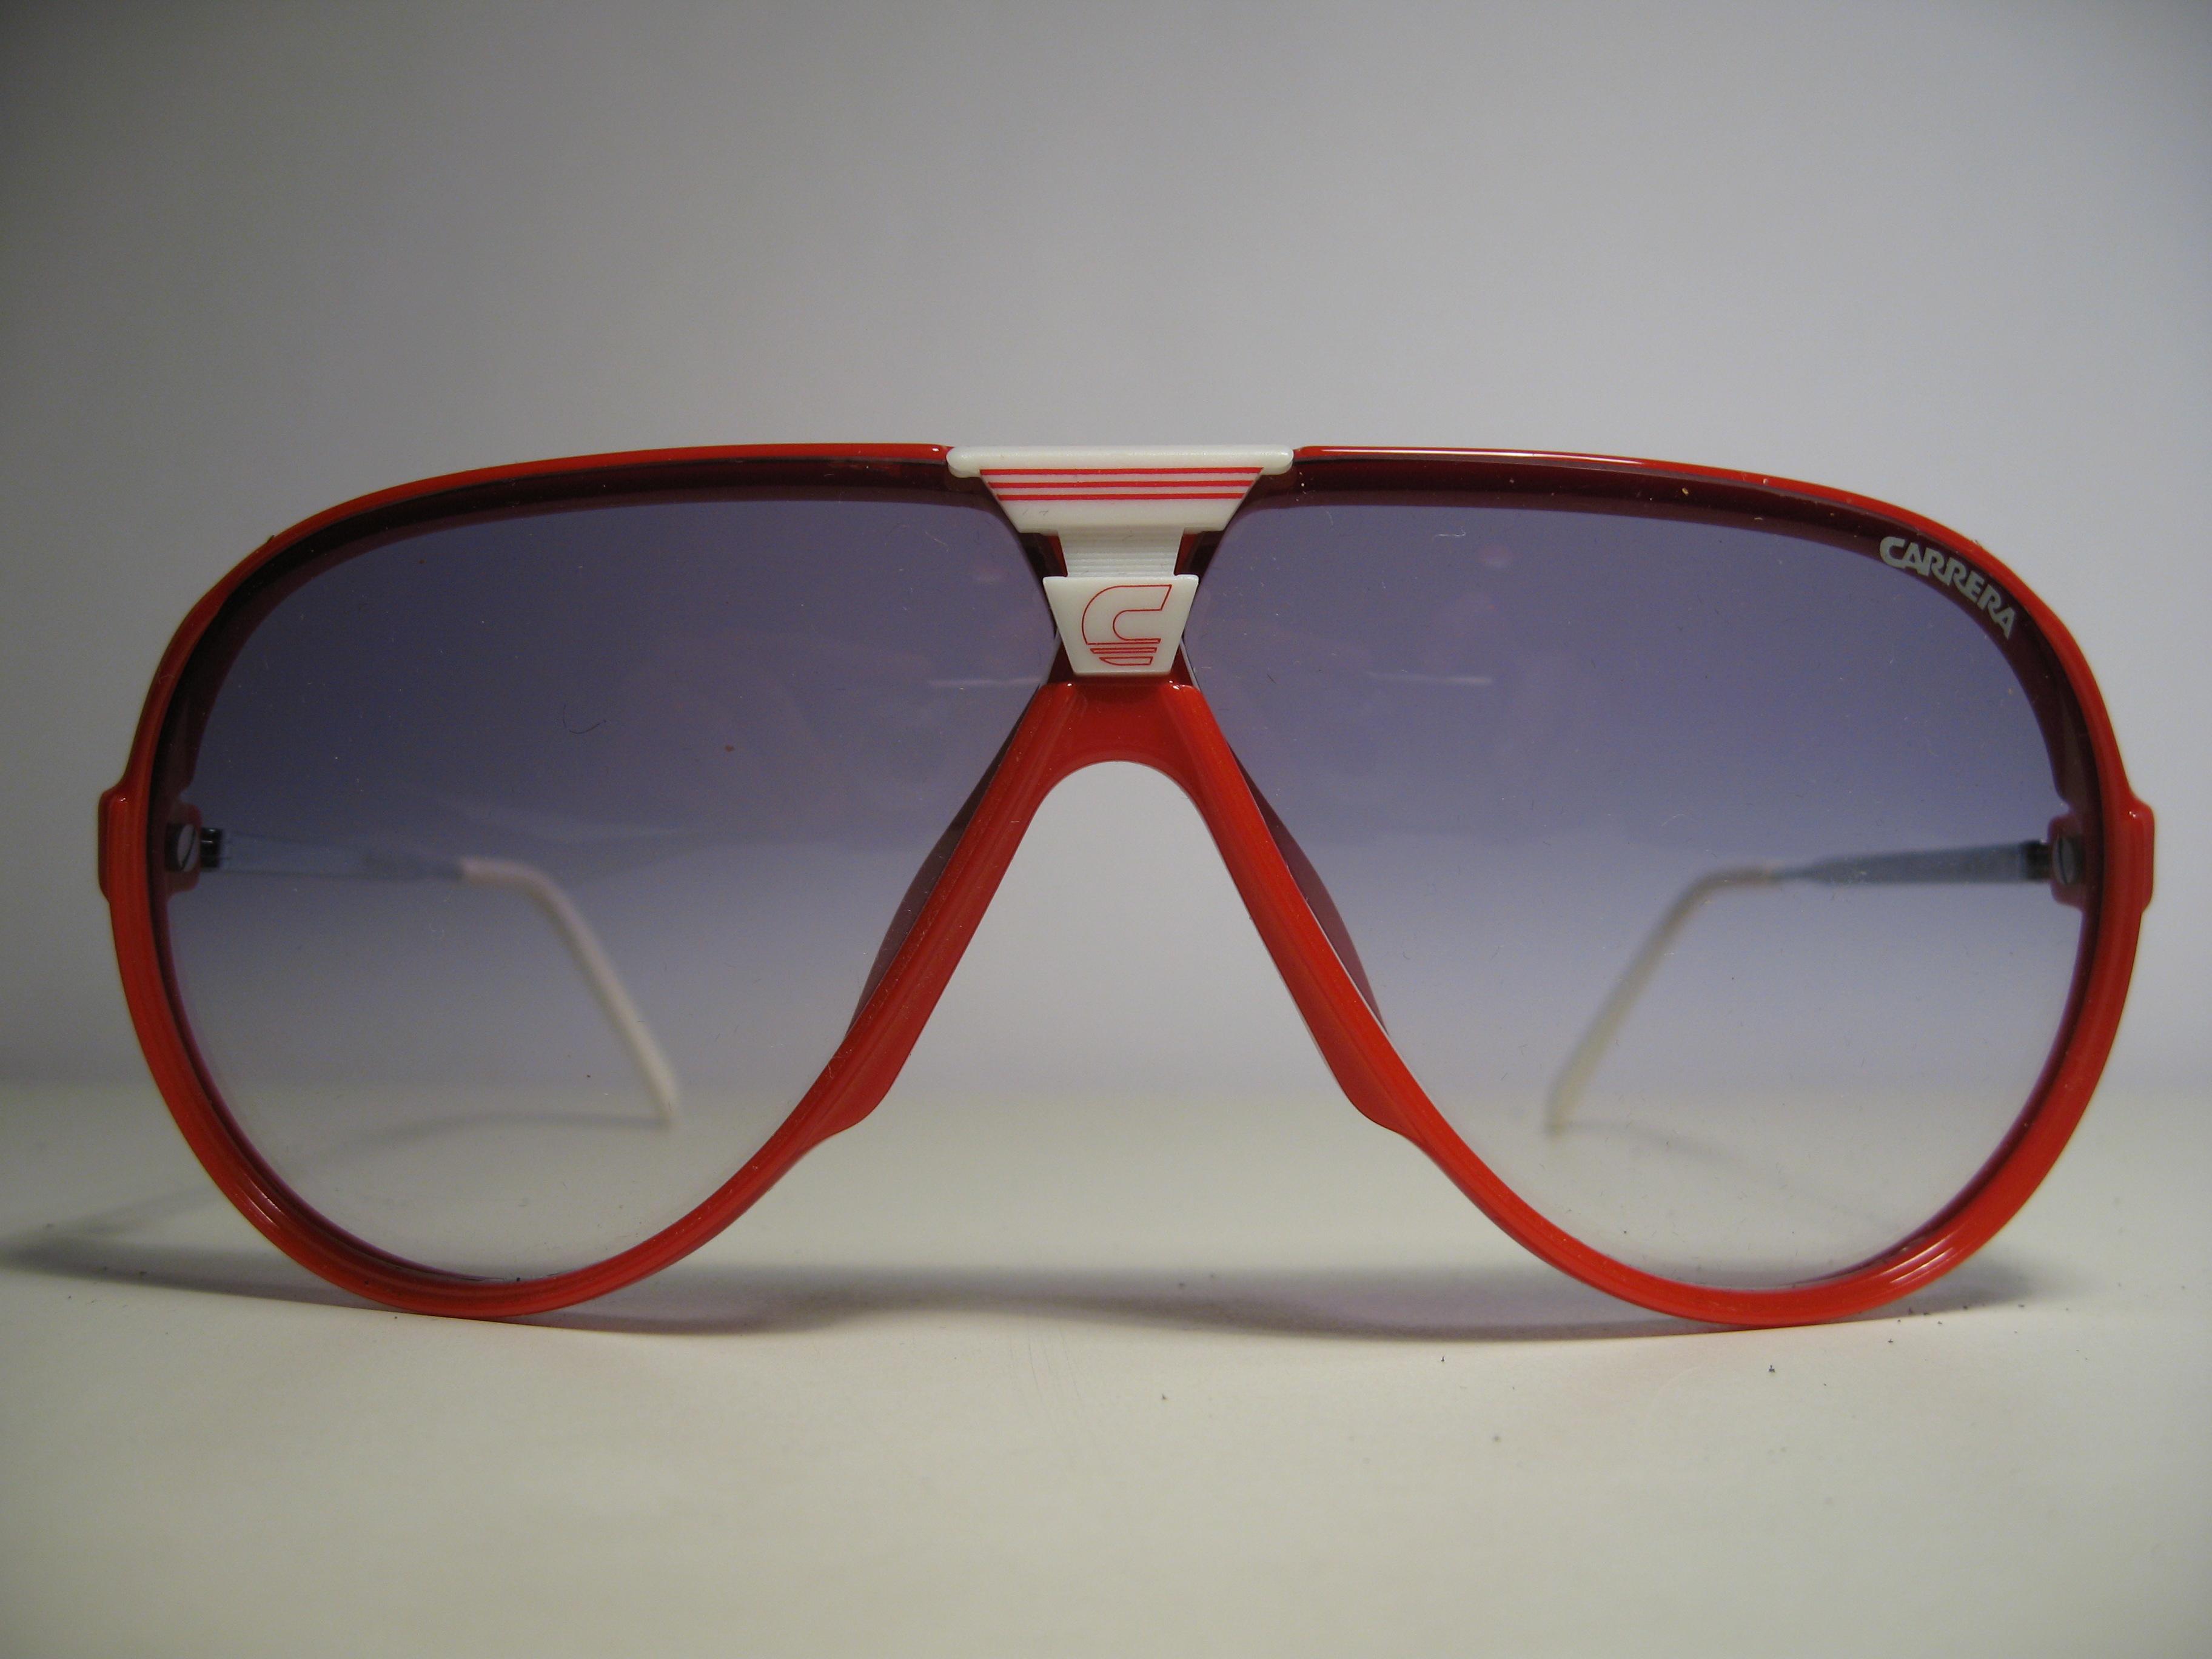 f2f6c81ab347c Carrera 5593 1980s Vintage Sunglasses Aviator red frame blue gradient